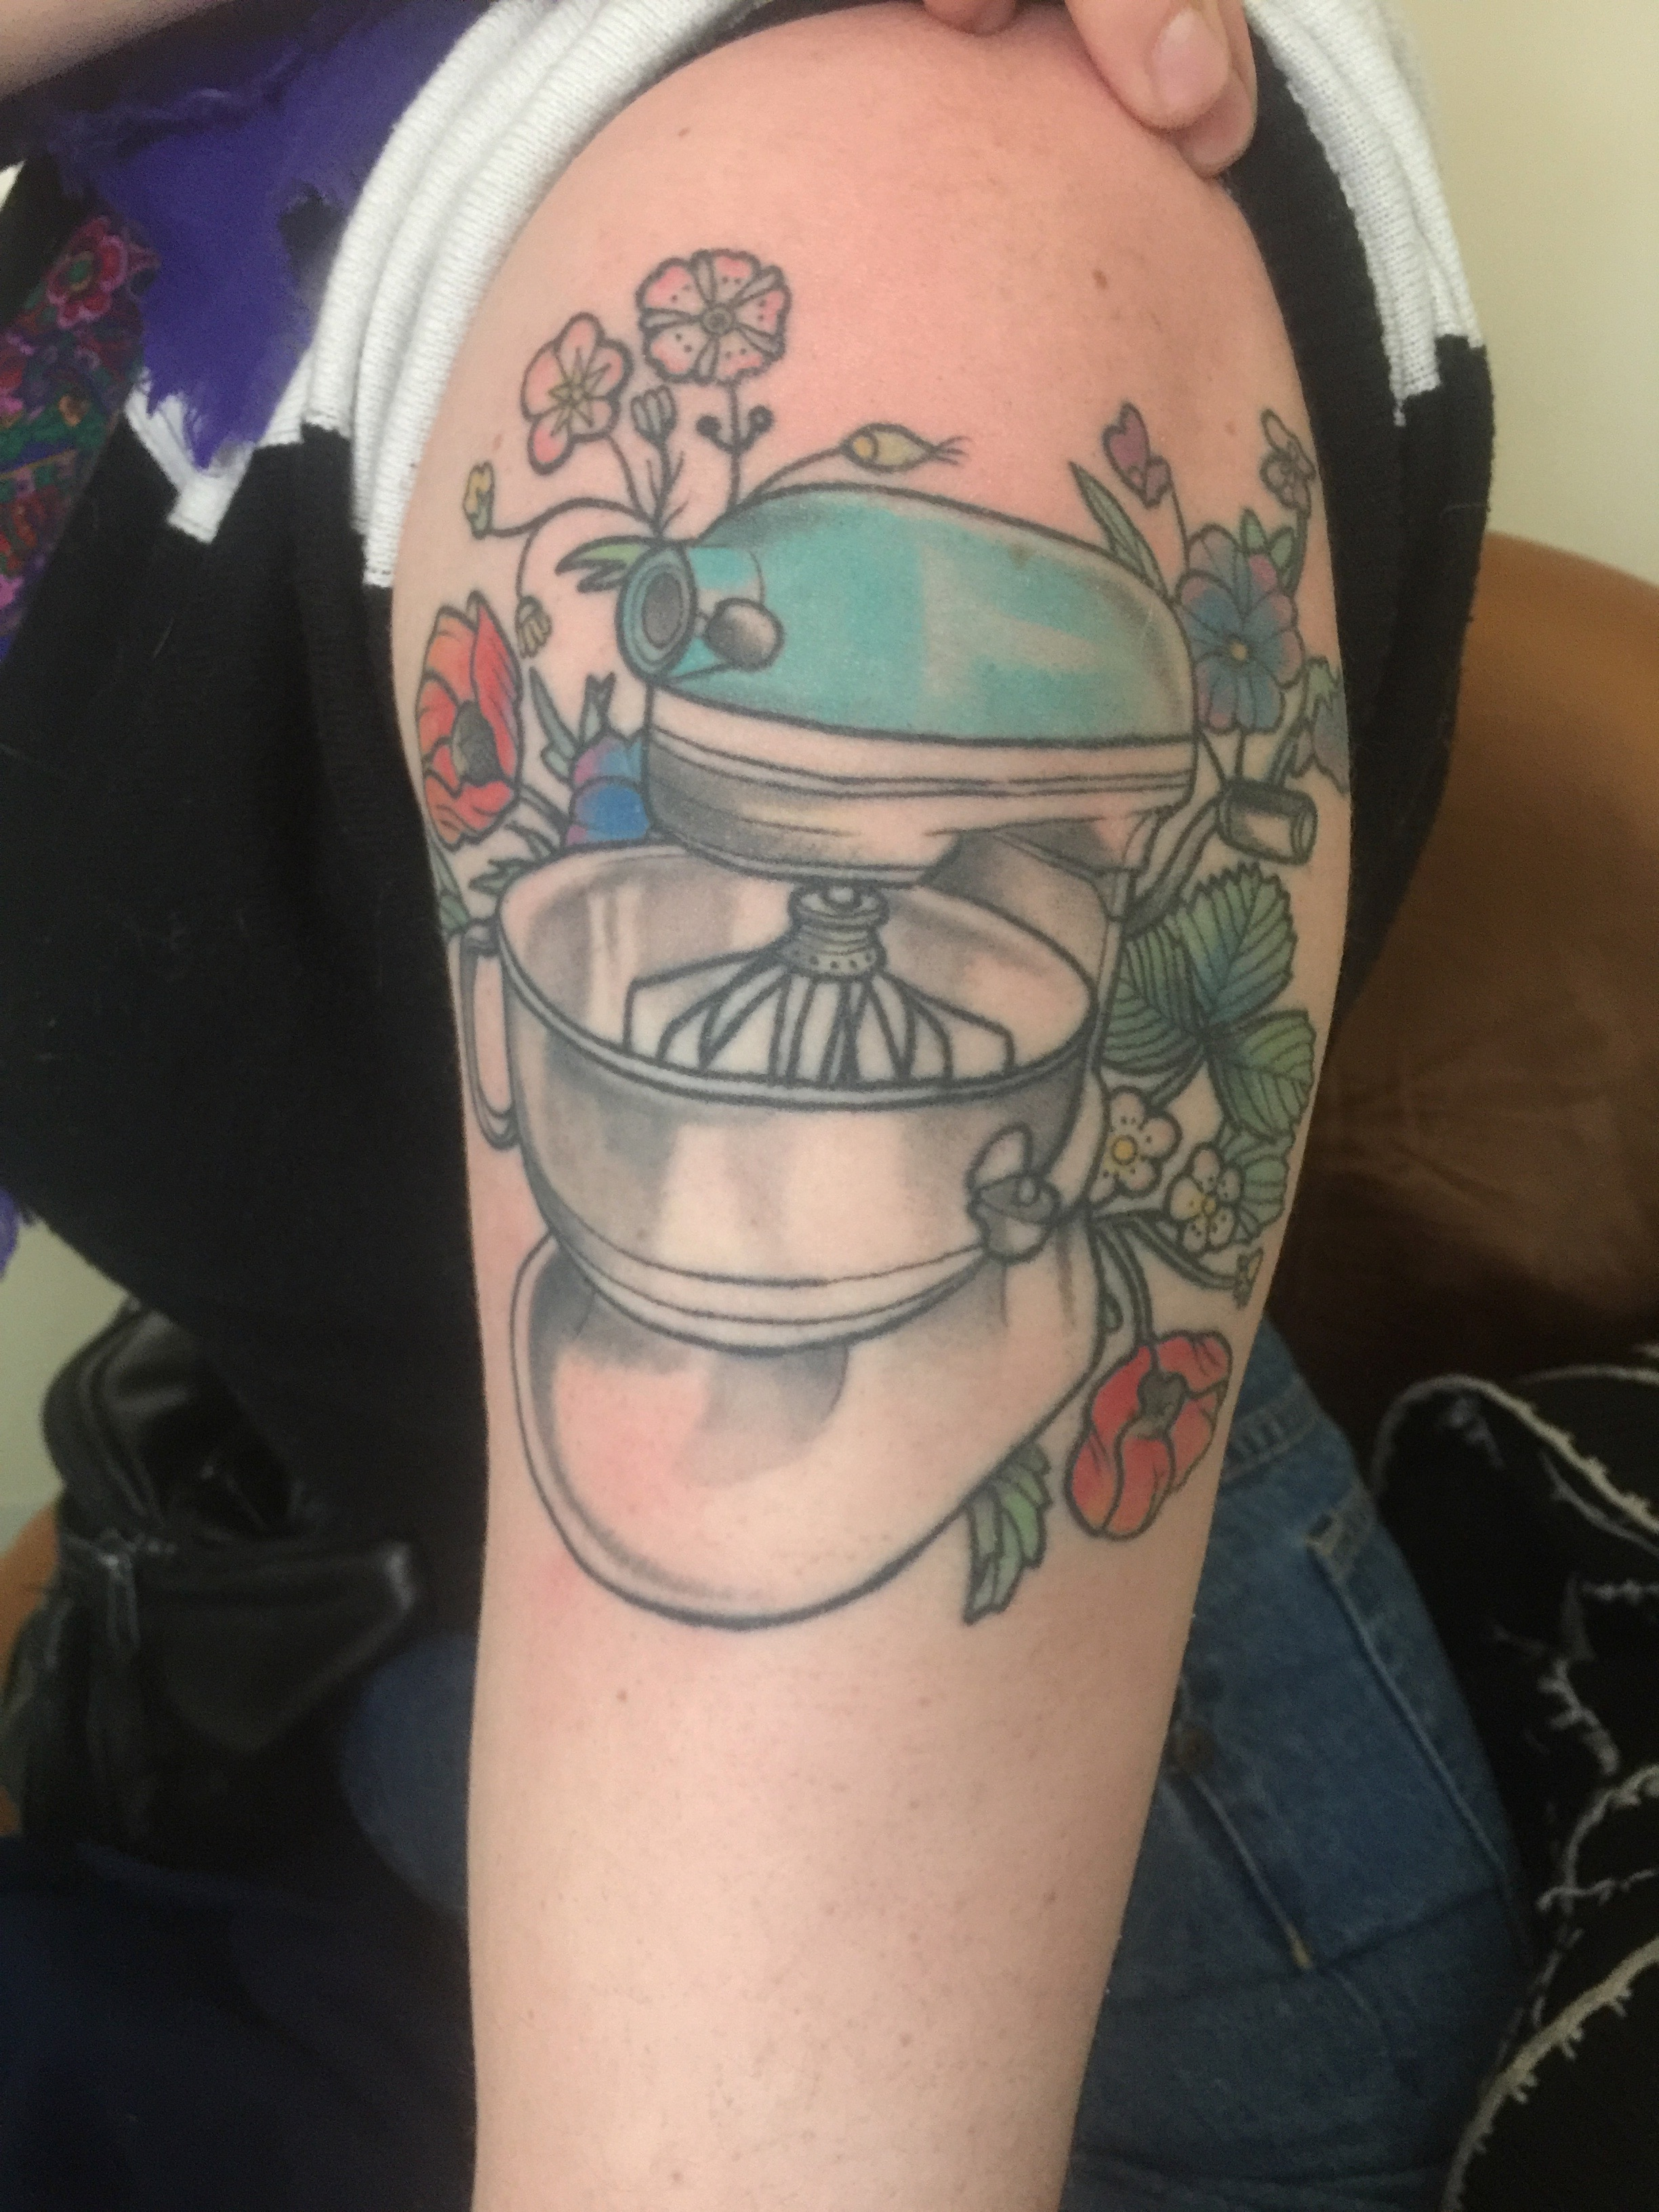 Abby Kastrul's mixer tattoo